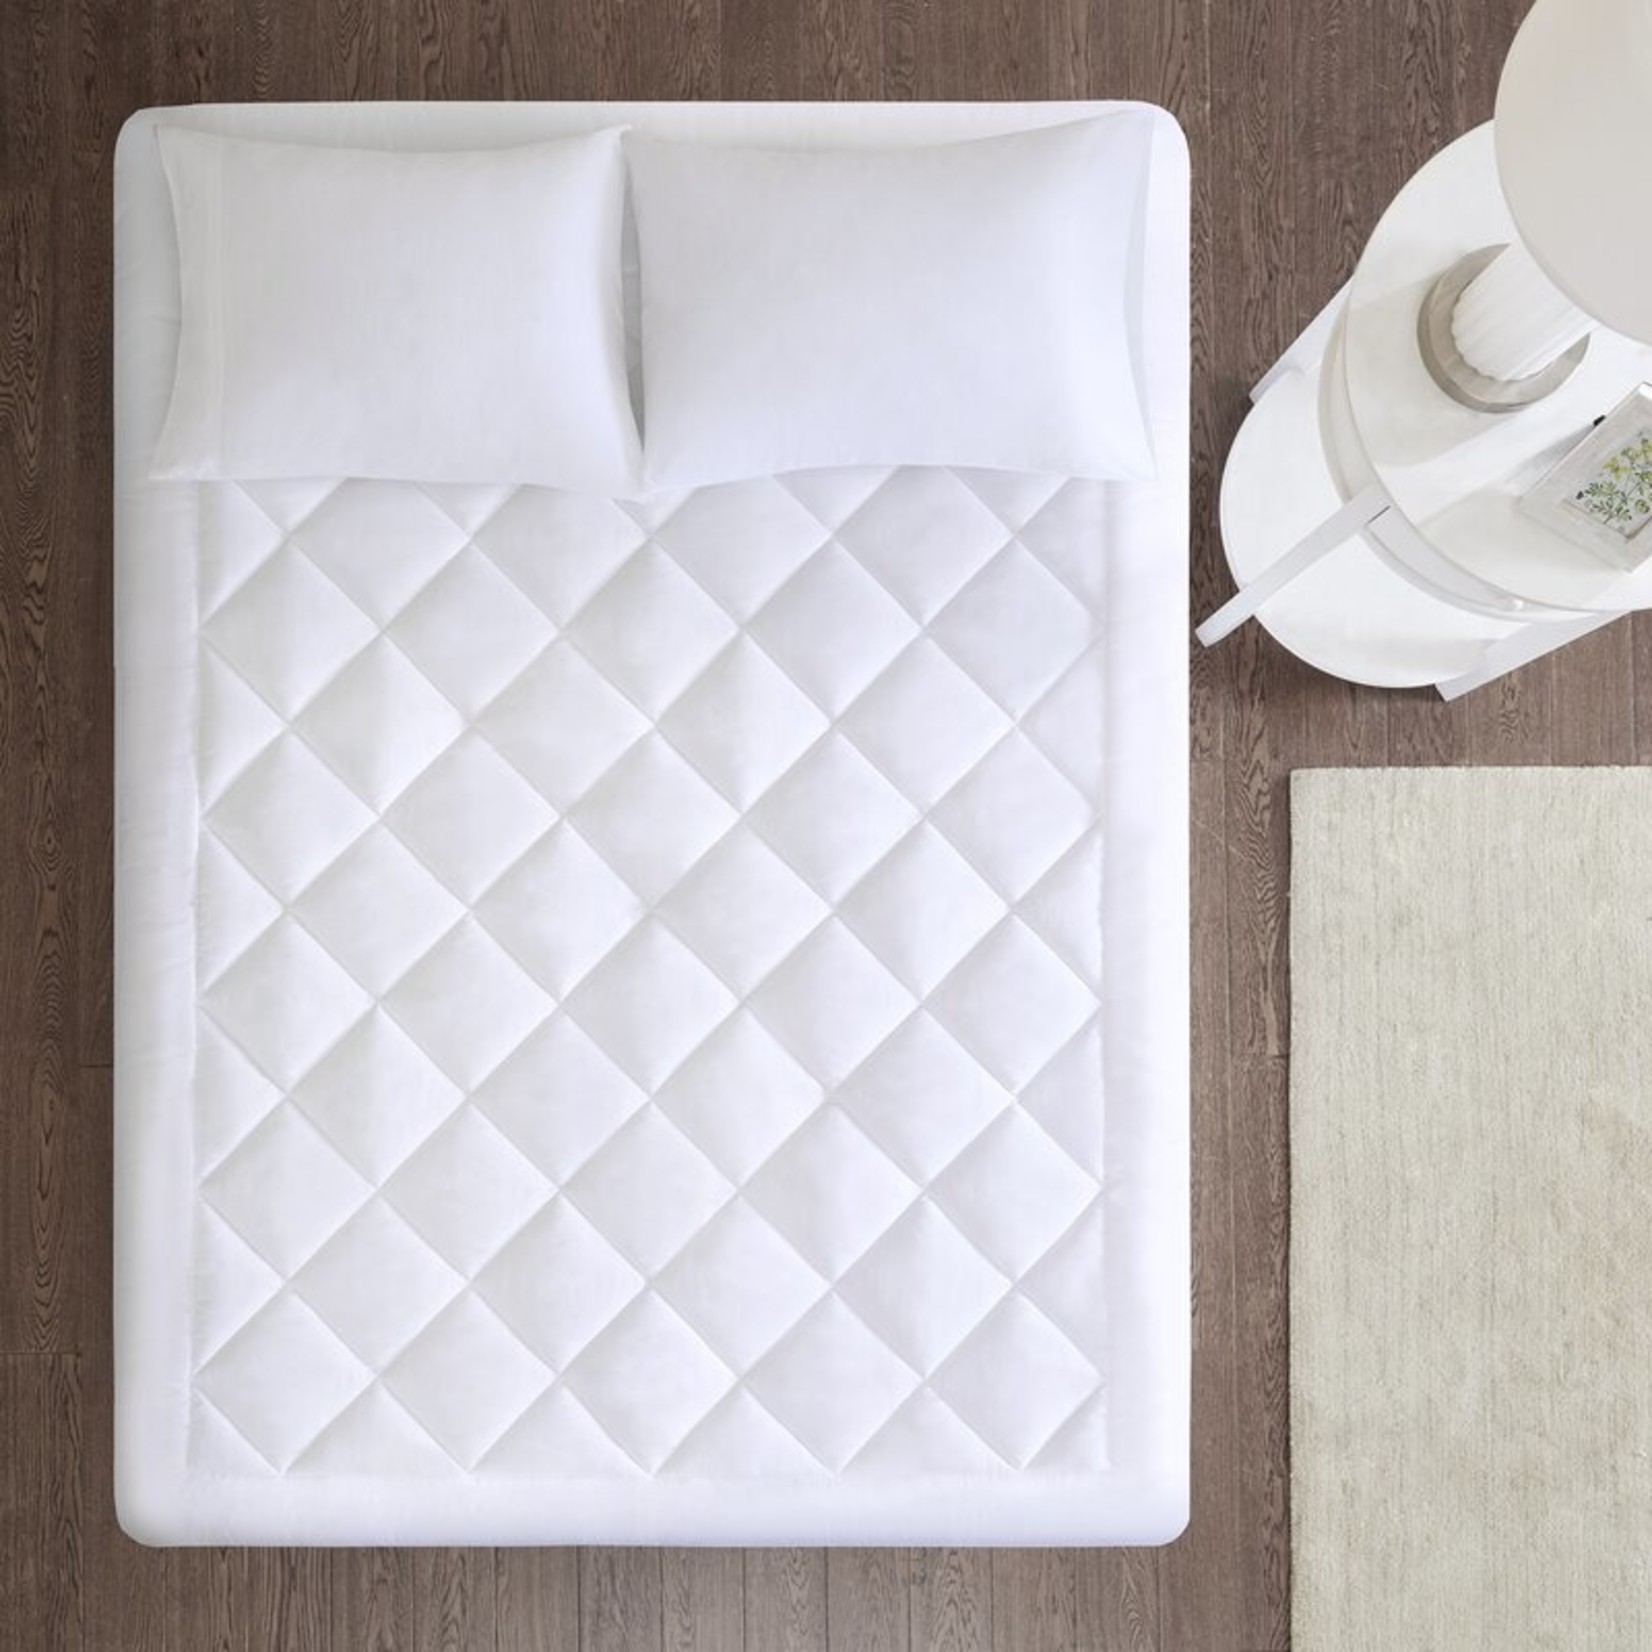 *Queen - Wayfair Sleep Waterproof Down Alternative Mattress Pad - Final Sale